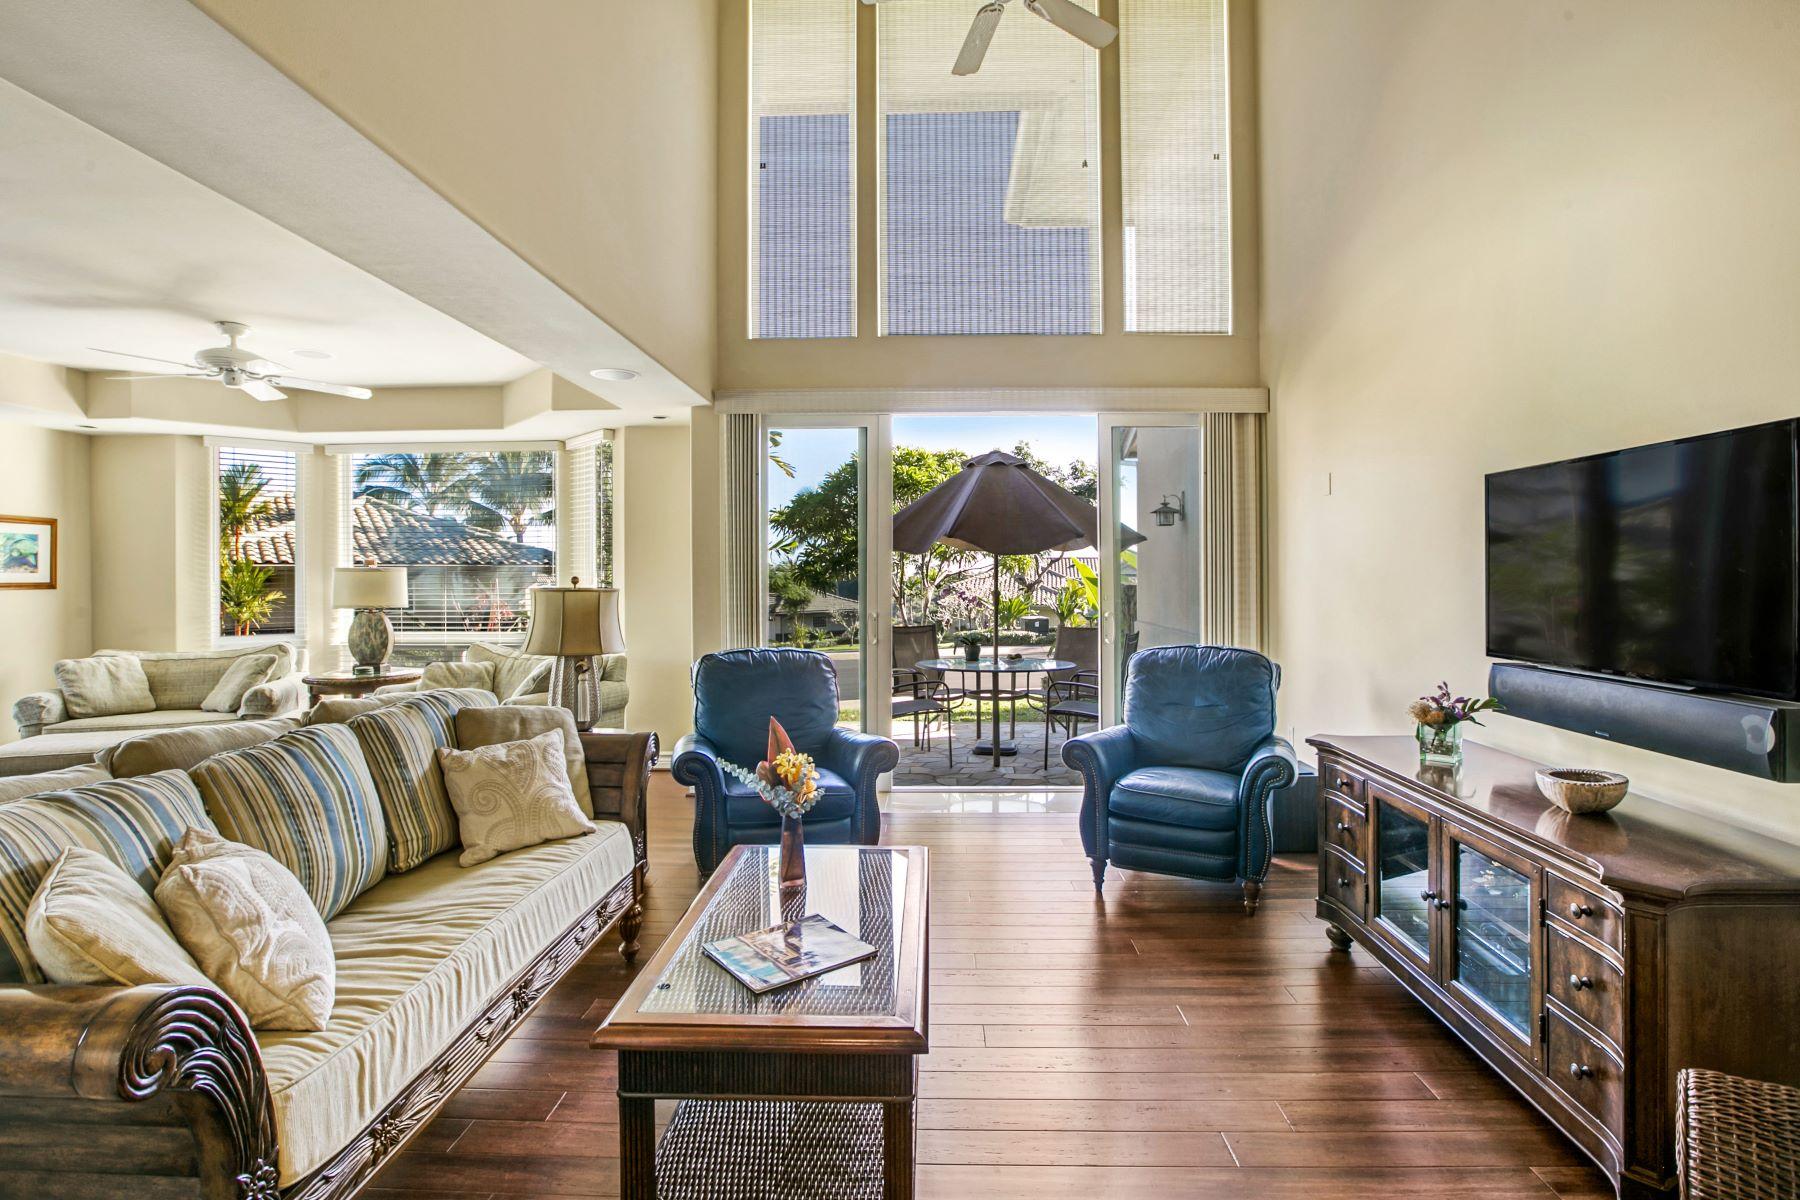 Condominiums 为 销售 在 4100 QUEEN EMMA DR #66 PRINCEVILLE, HI 96722 4100 QUEEN EMMA DR #66 普林斯维尔, 夏威夷 96722 美国